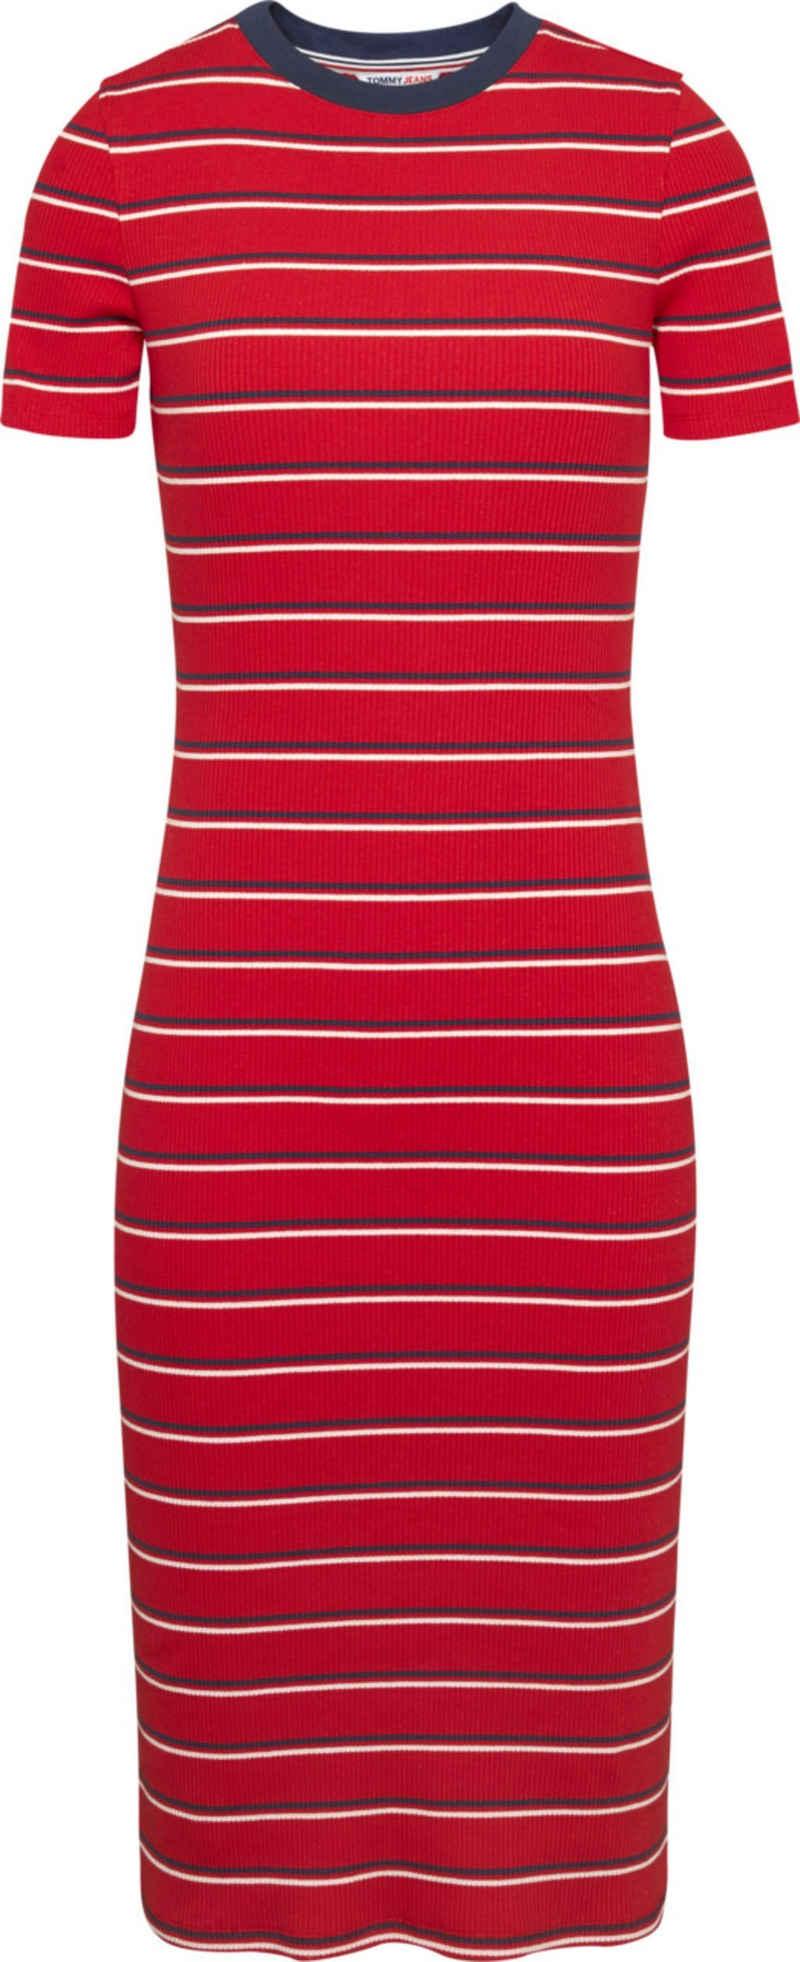 Tommy Jeans Jerseykleid »TJW Striped Rib Bodycon Dress« im allover Ringeldessin & Tommy Jeans Logo-Flag